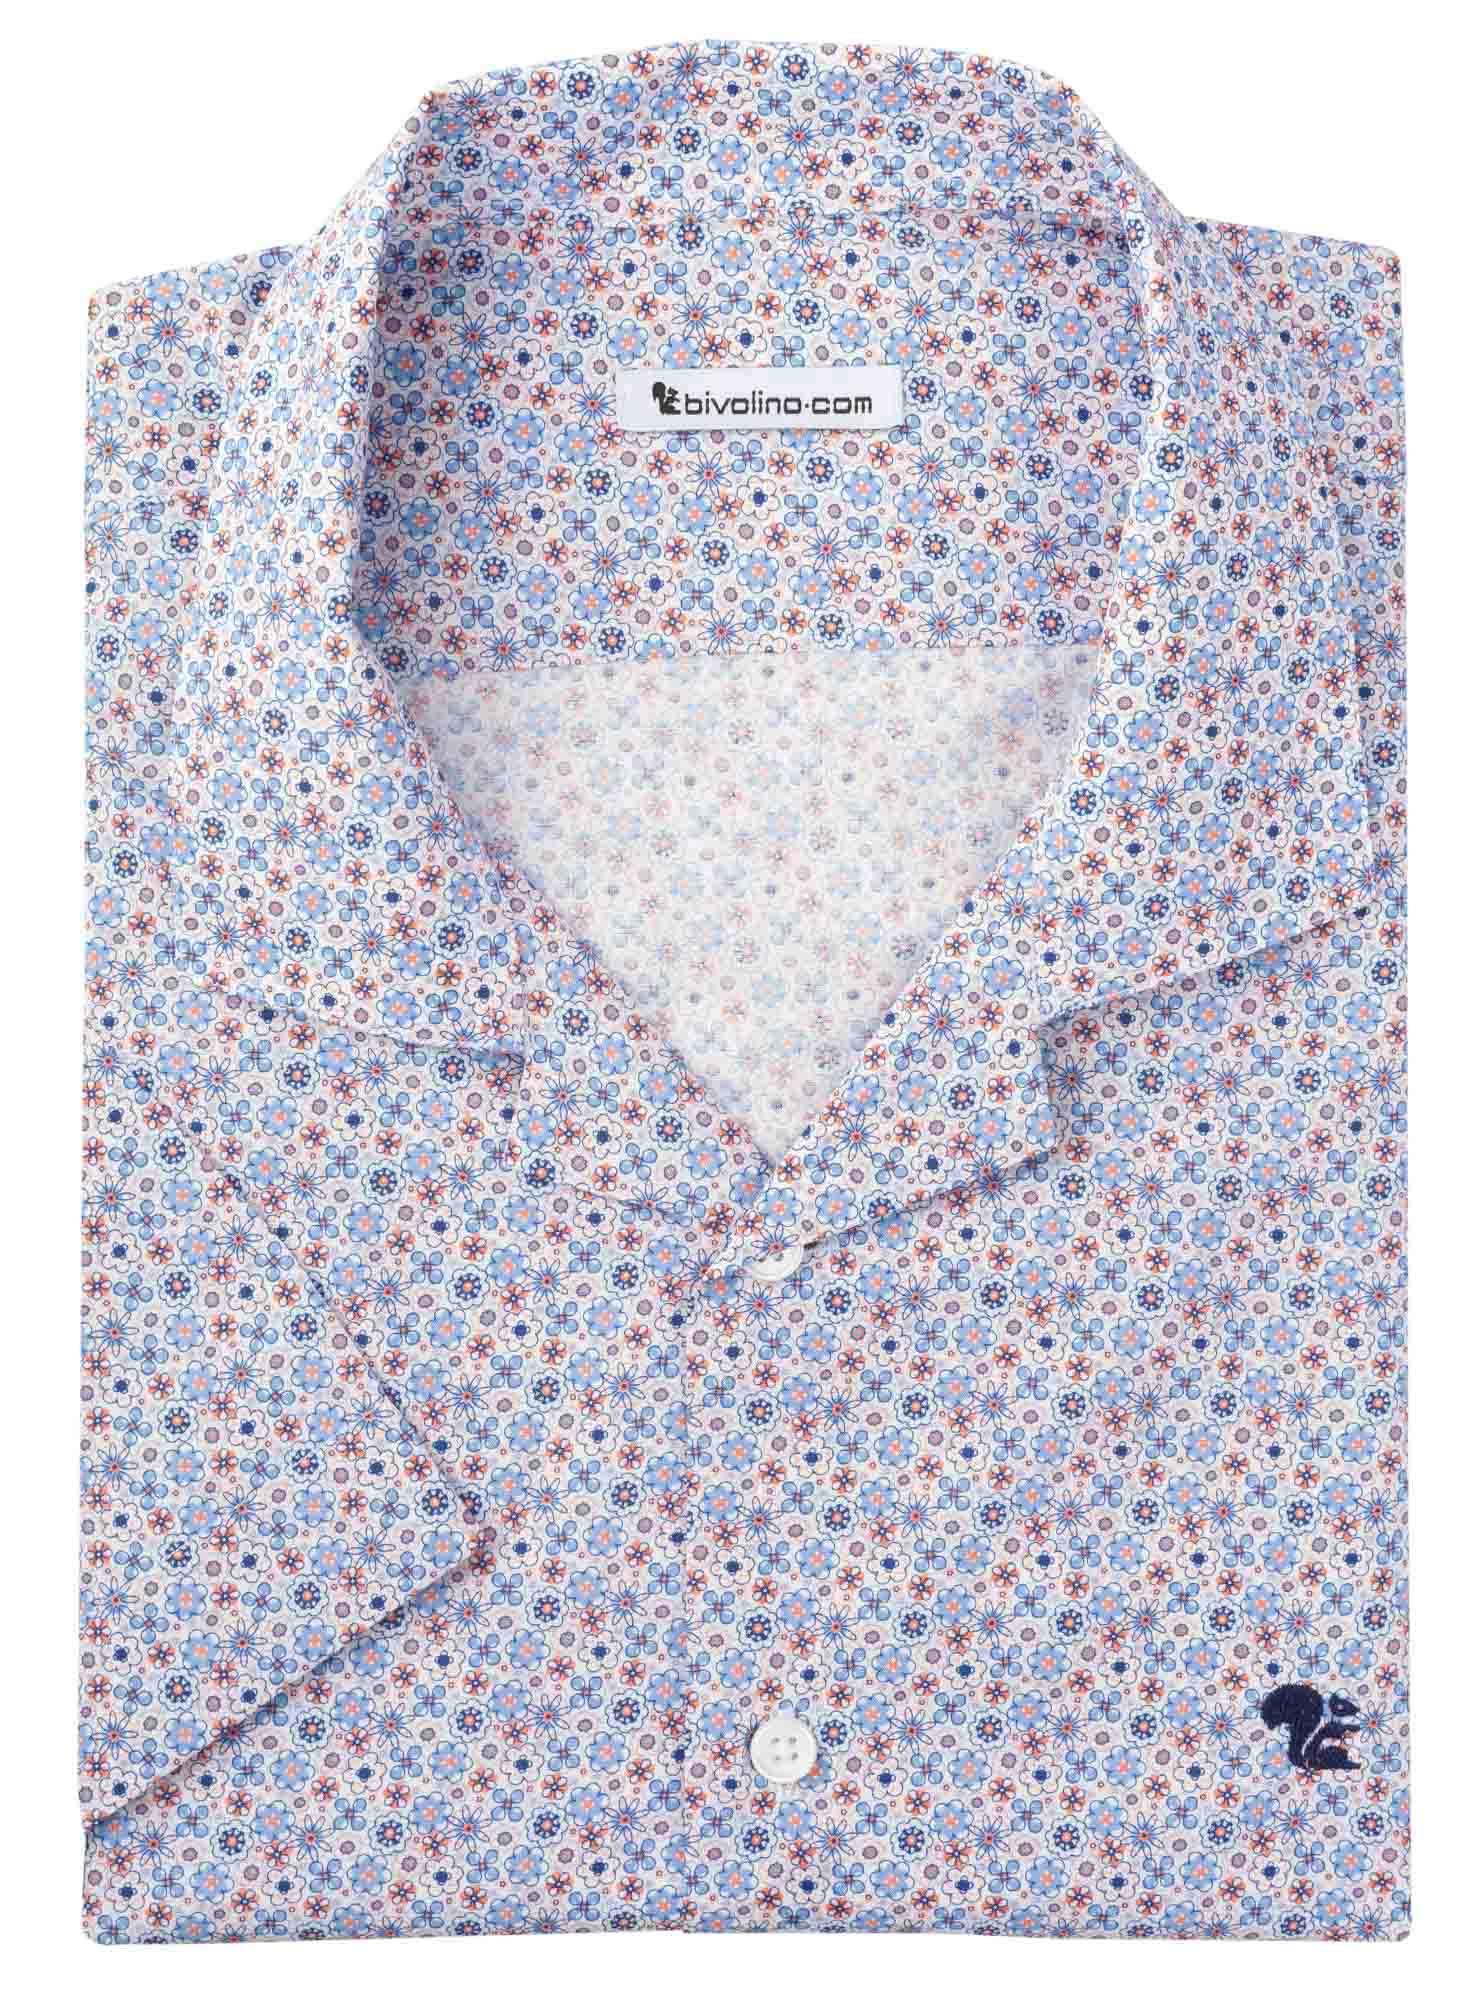 AWINI - cotton hawaiian shirt - Manio 4